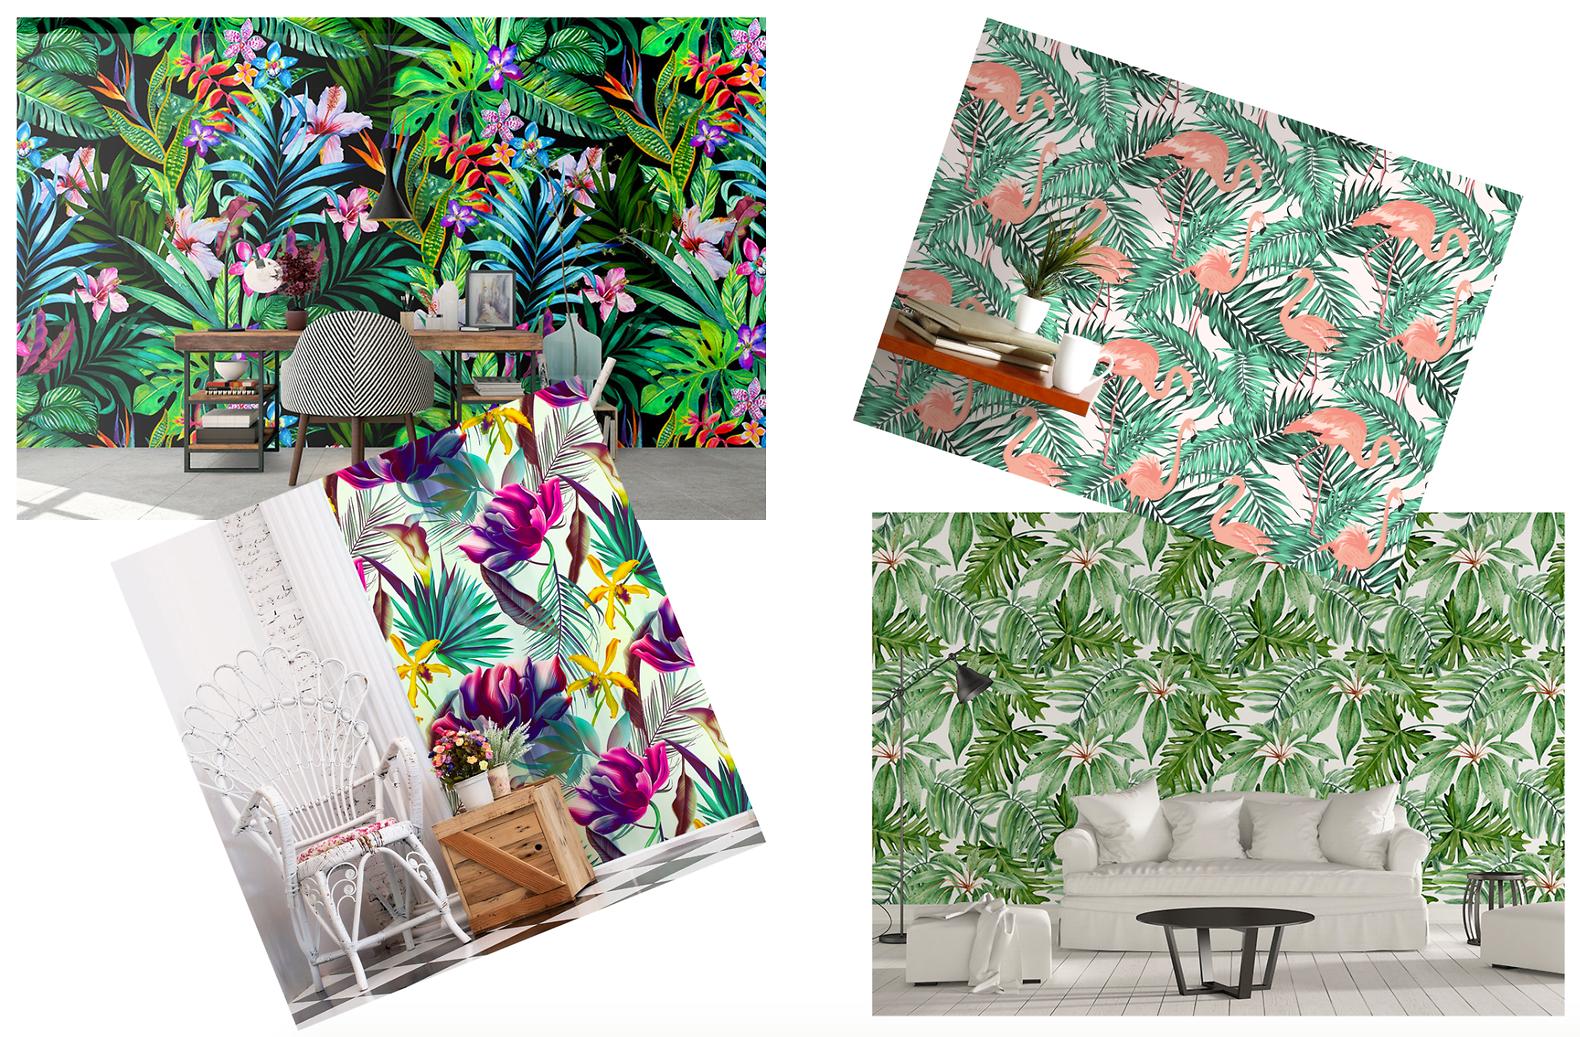 Tropical Wallpaper for Boring Cabinet Doors